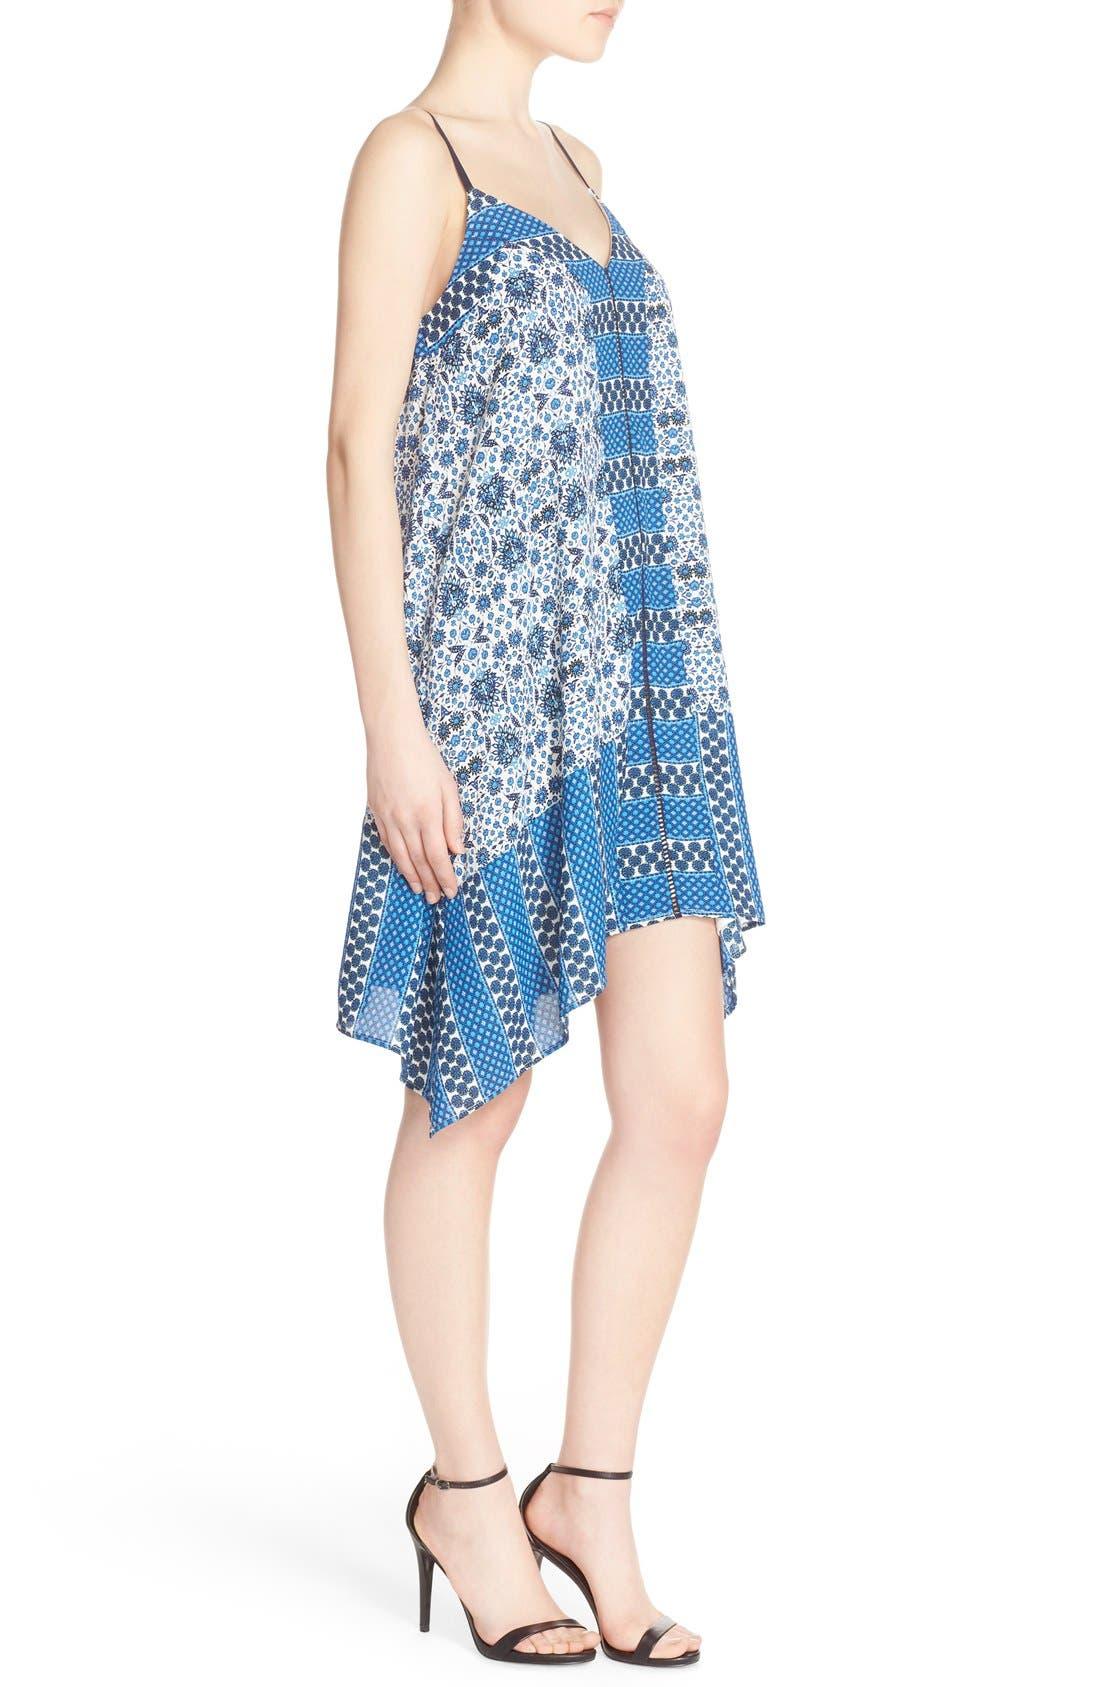 ADELYN RAE, Scarf Print Crepe Trapeze Dress, Alternate thumbnail 4, color, 400